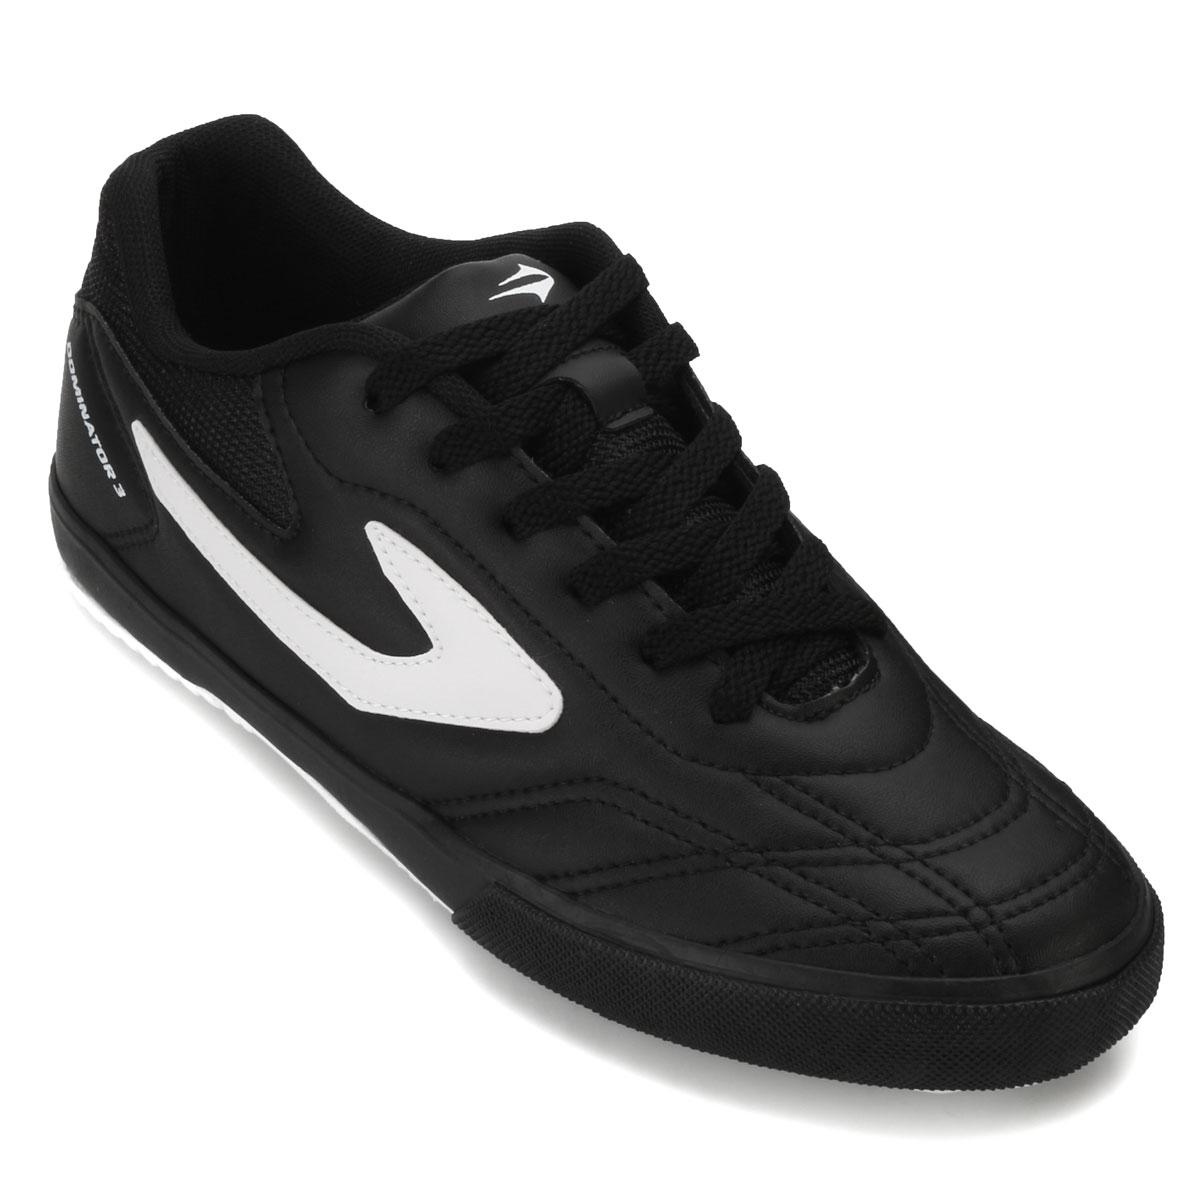 cab7b2de9e038 Chuteira Futsal Topper Dominator III Preto-Branco   Alex Shoes